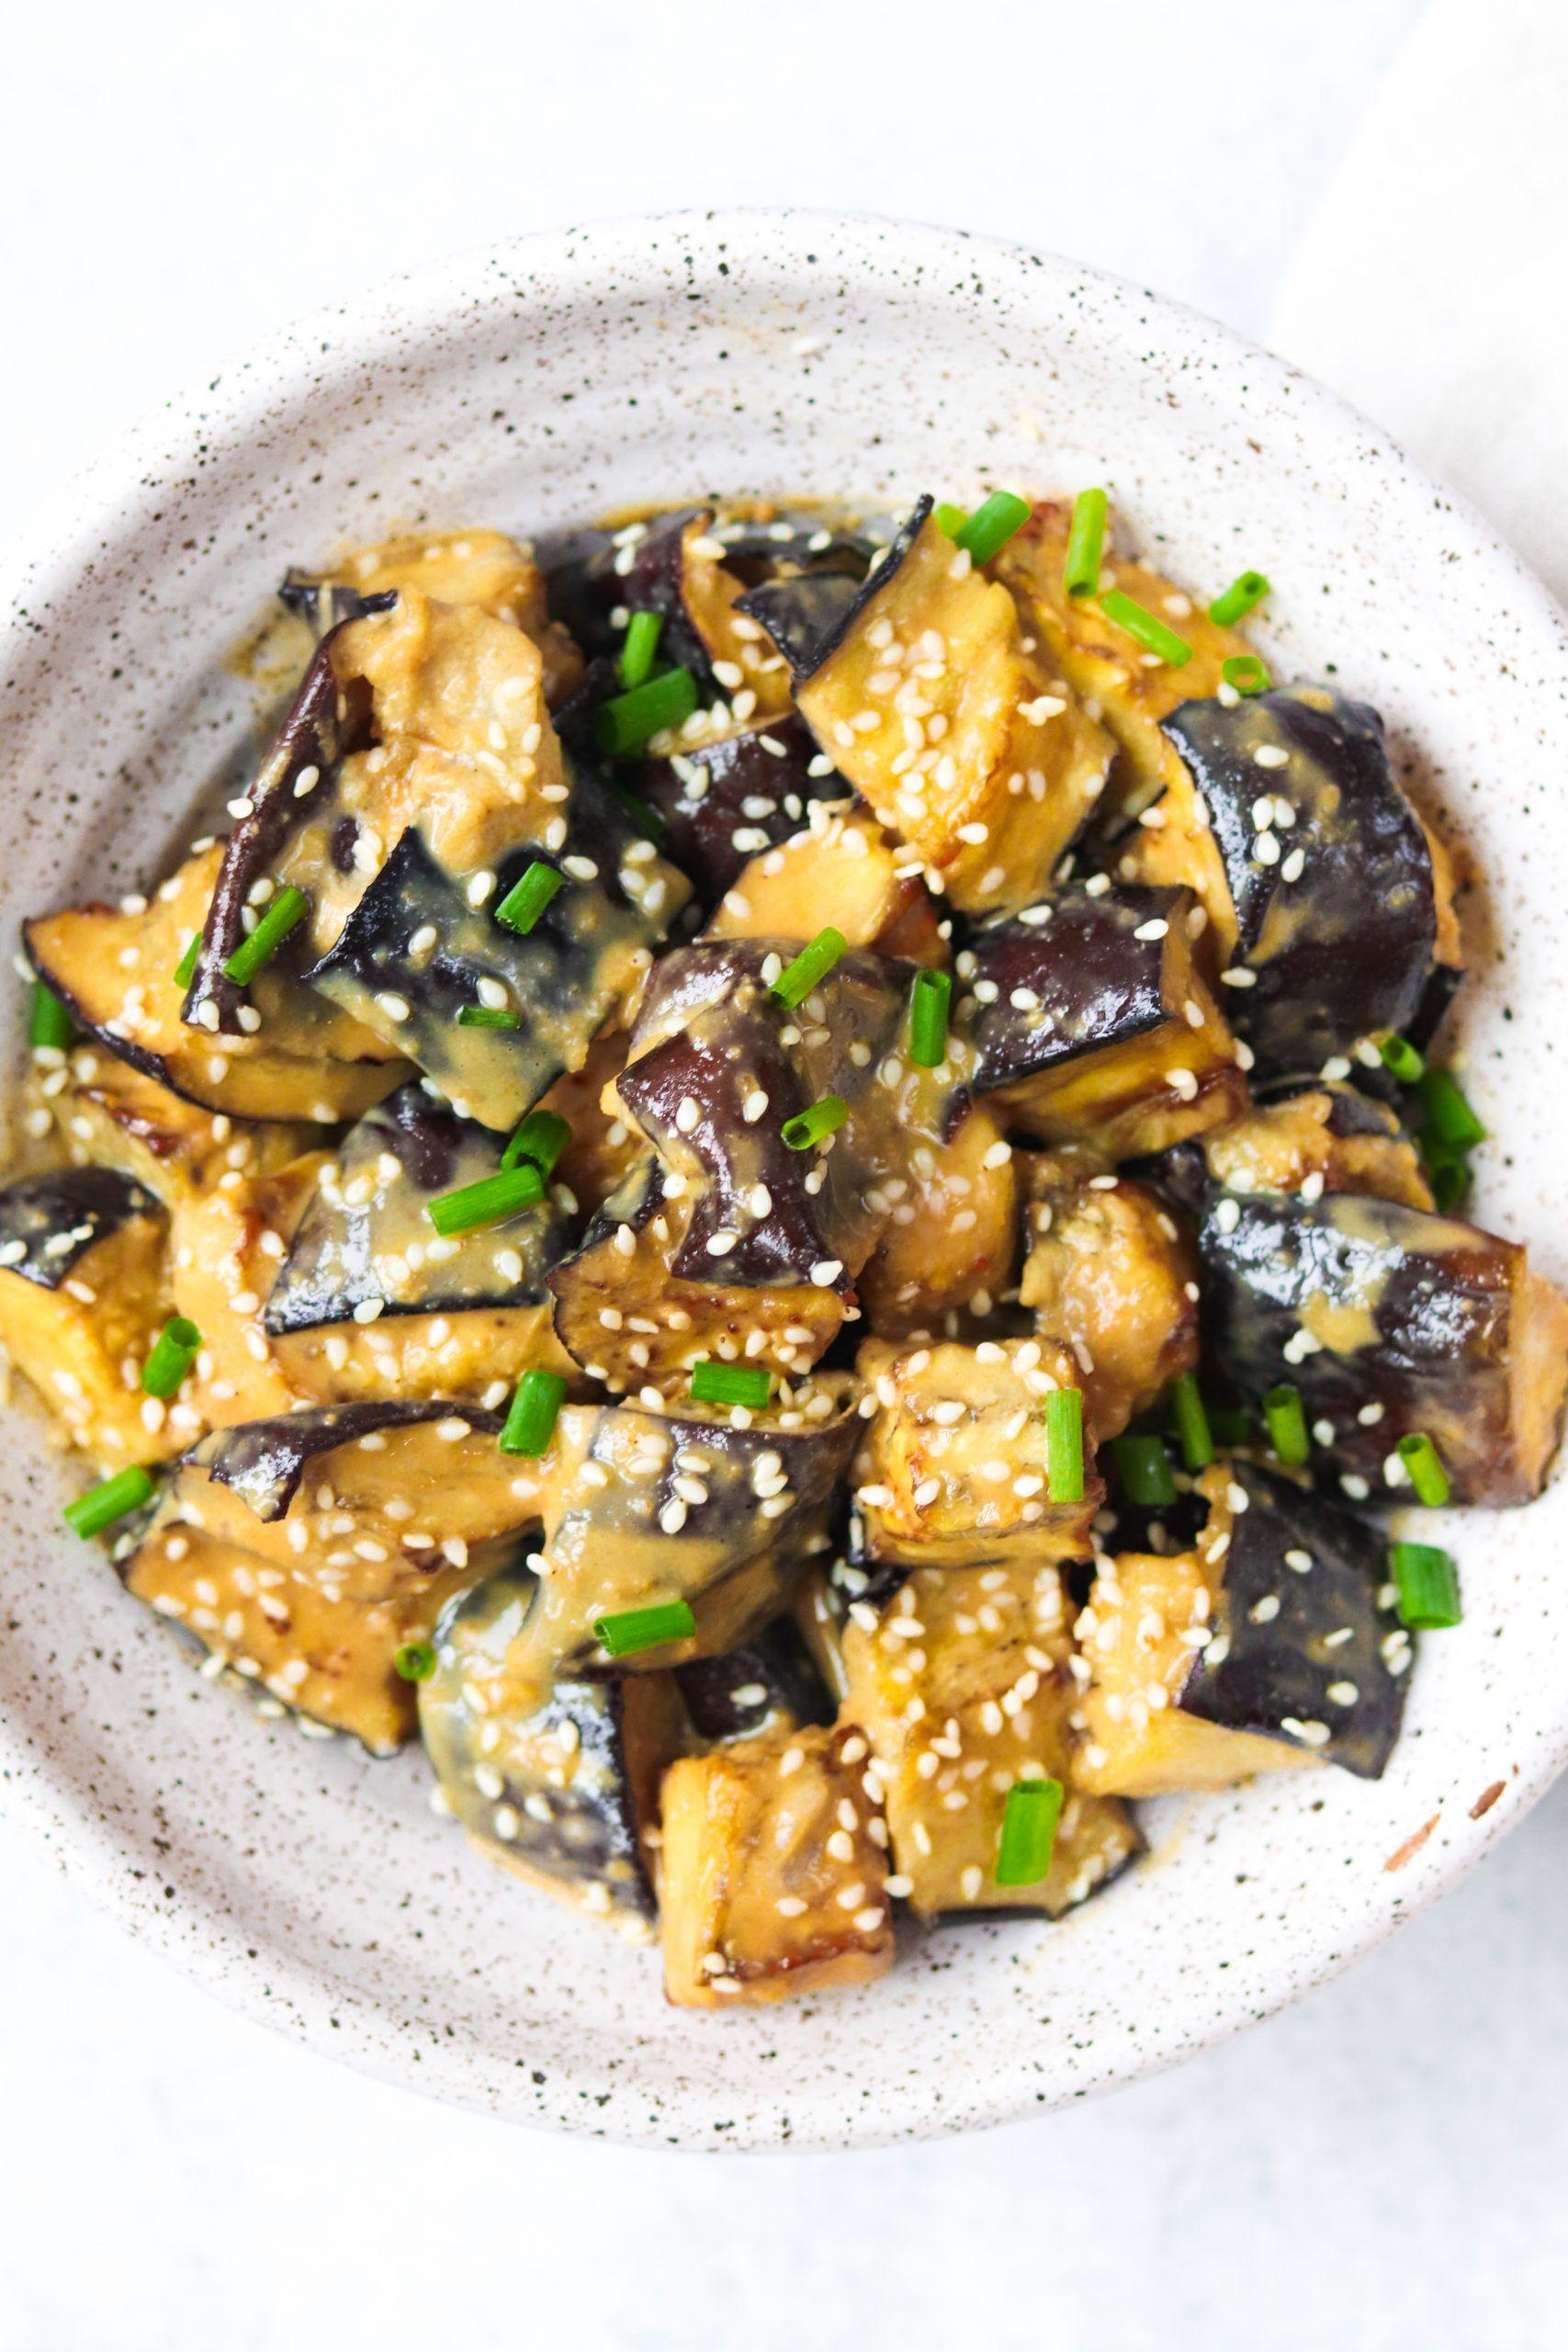 Miso Sesame Ginger Eggplant Vegan Gluten Free Daisybeet Recipe In 2020 Ginger Recipes Eggplant Recipes Eggplant Dishes